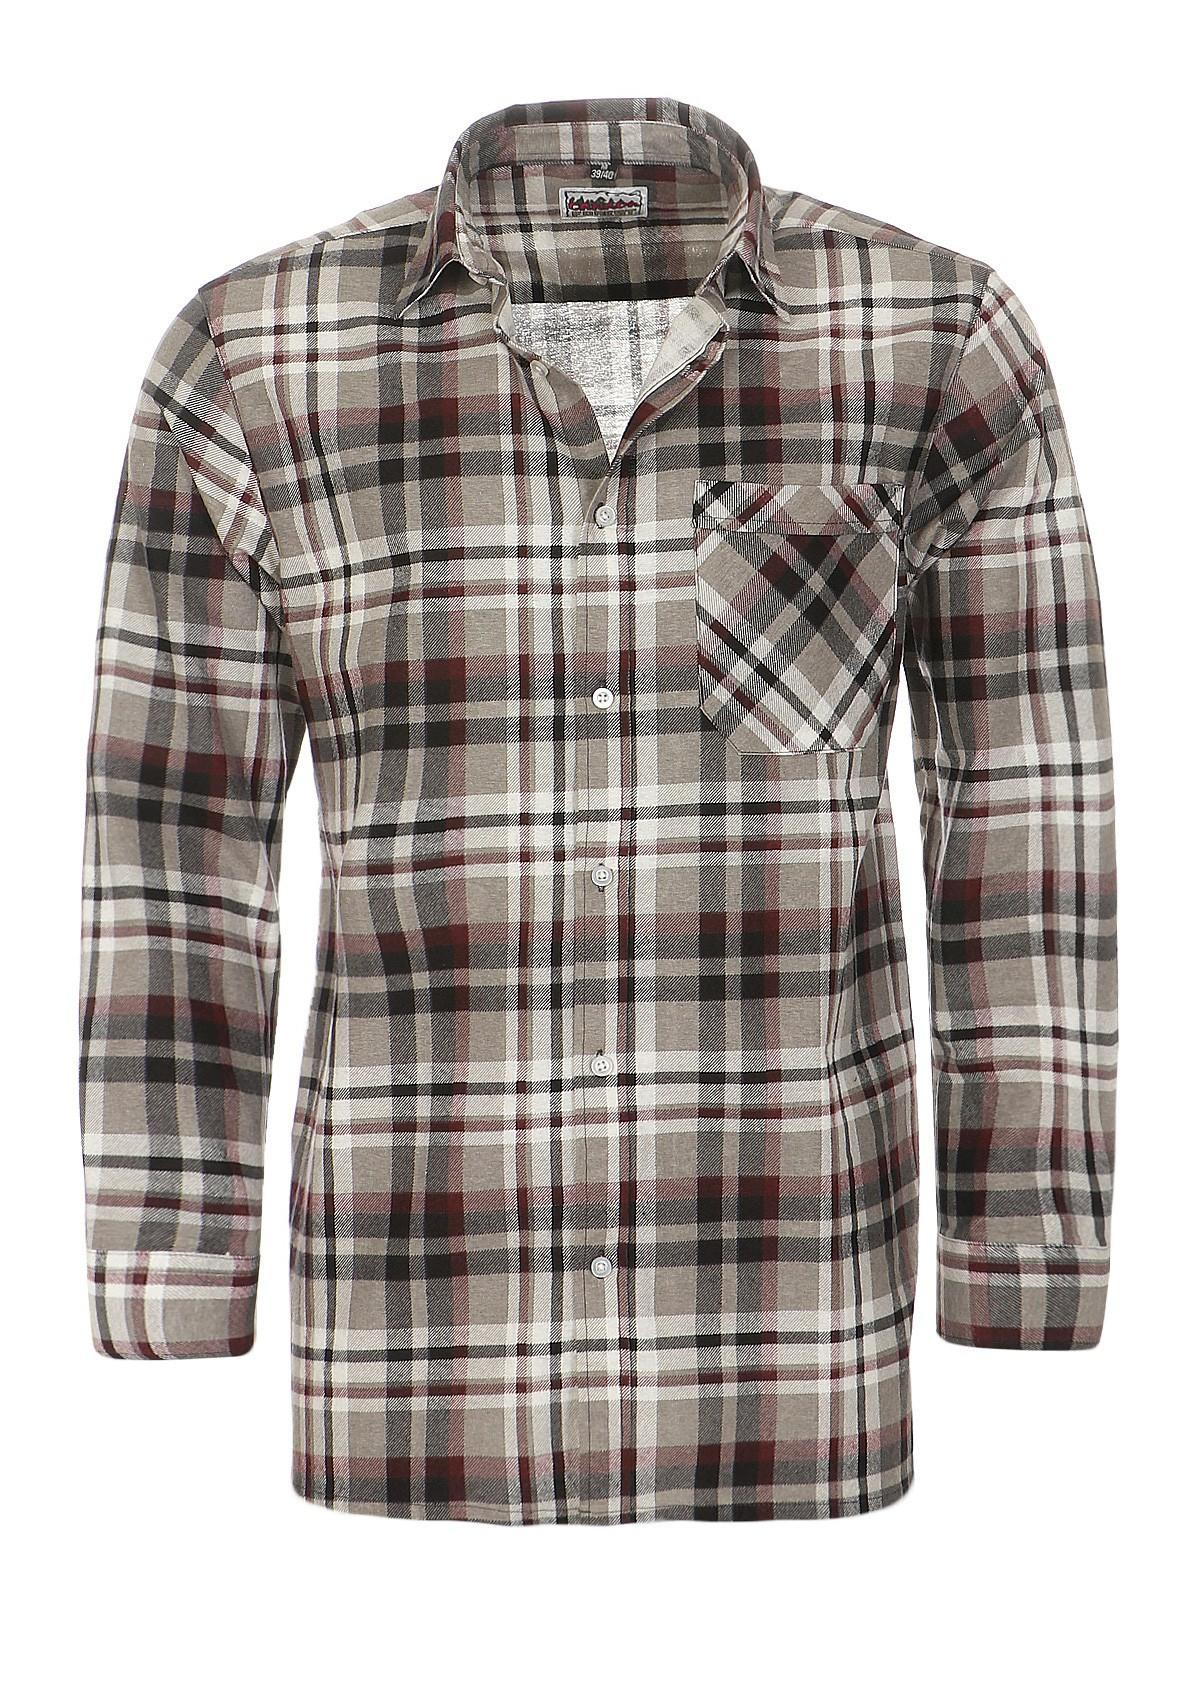 3 Arbeitshemden in Holzfällerkaro-Optik - 85 cm Rückenlänge – Bild 2